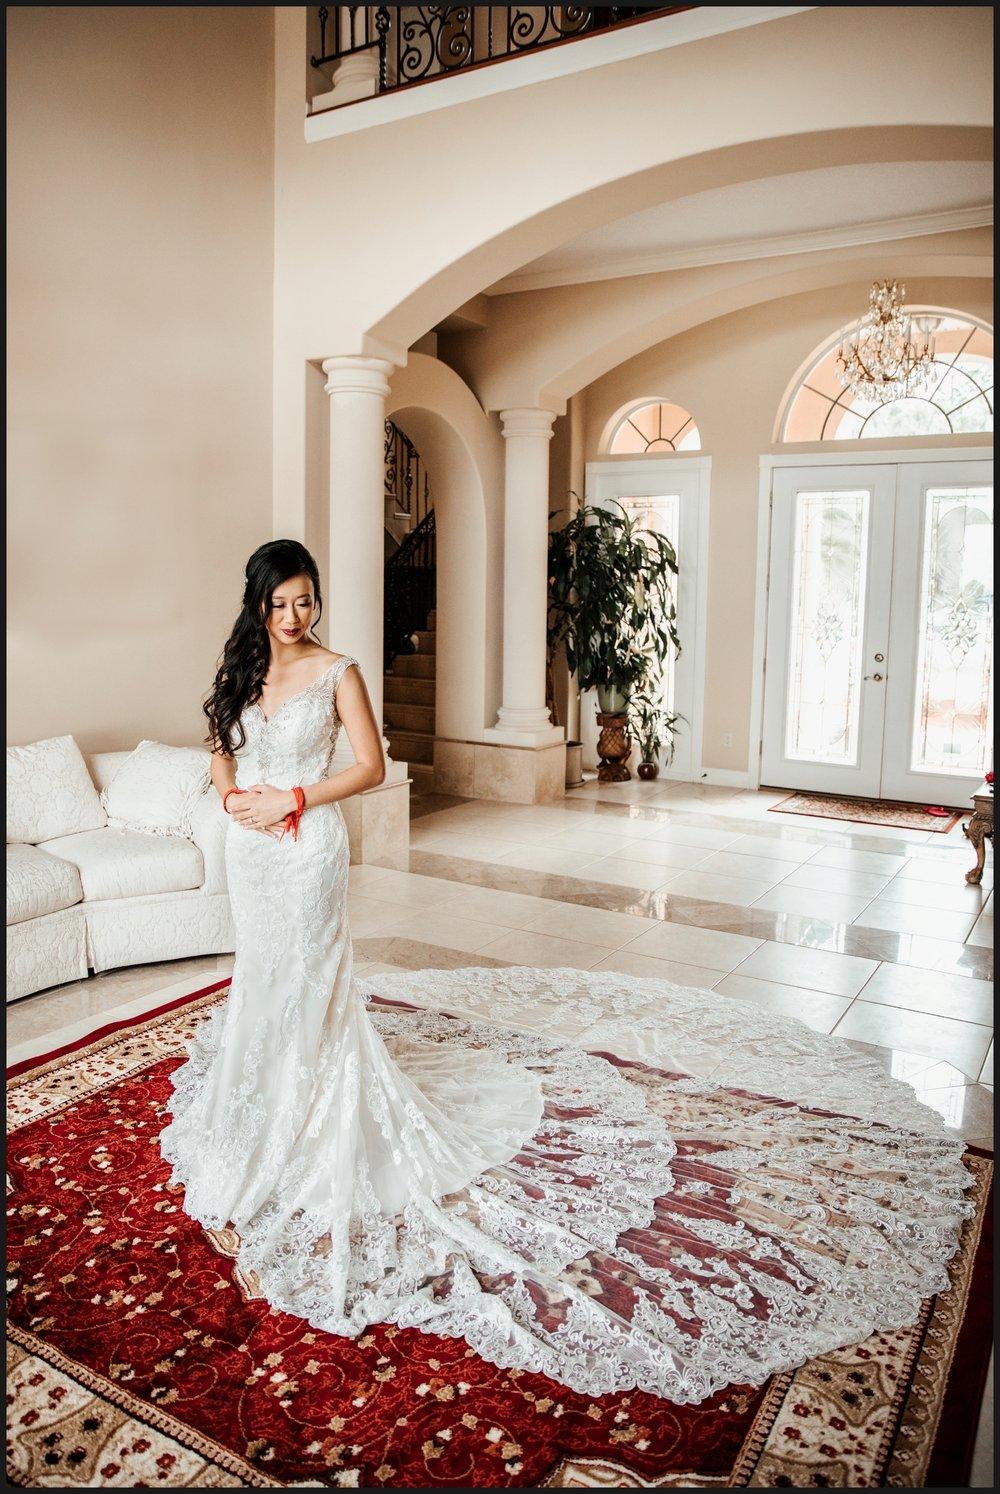 Orlando-Wedding-Photographer-destination-wedding-photographer-florida-wedding-photographer-bohemian-wedding-photographer_1403.jpg